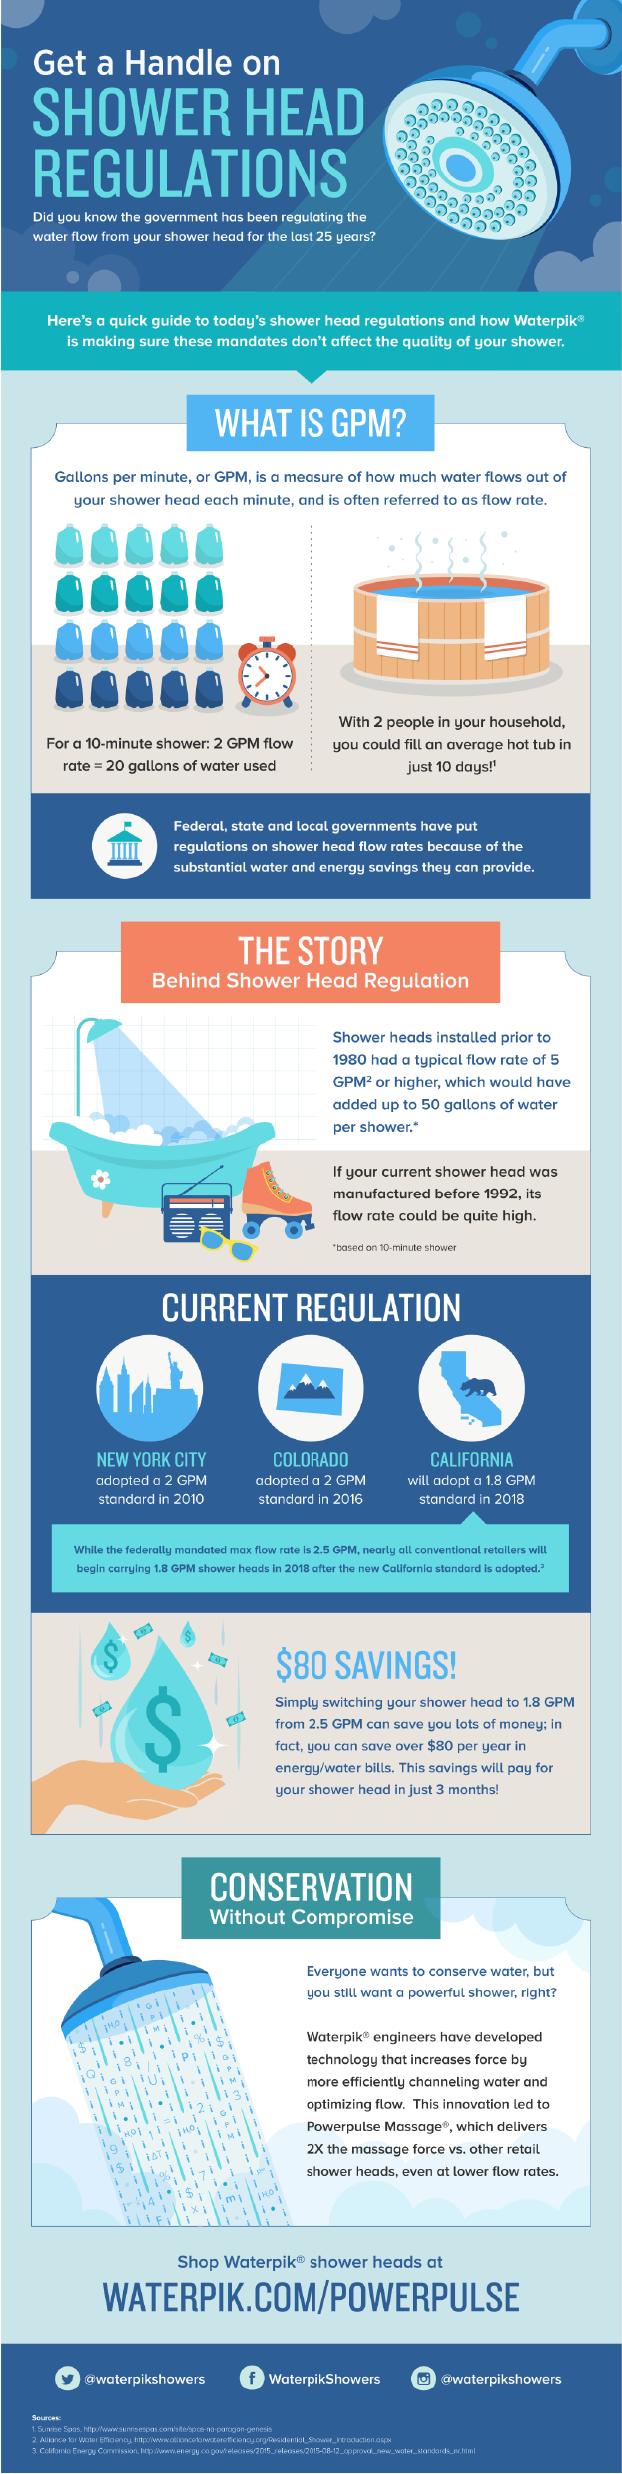 Waterpik Infographic r4-01-01